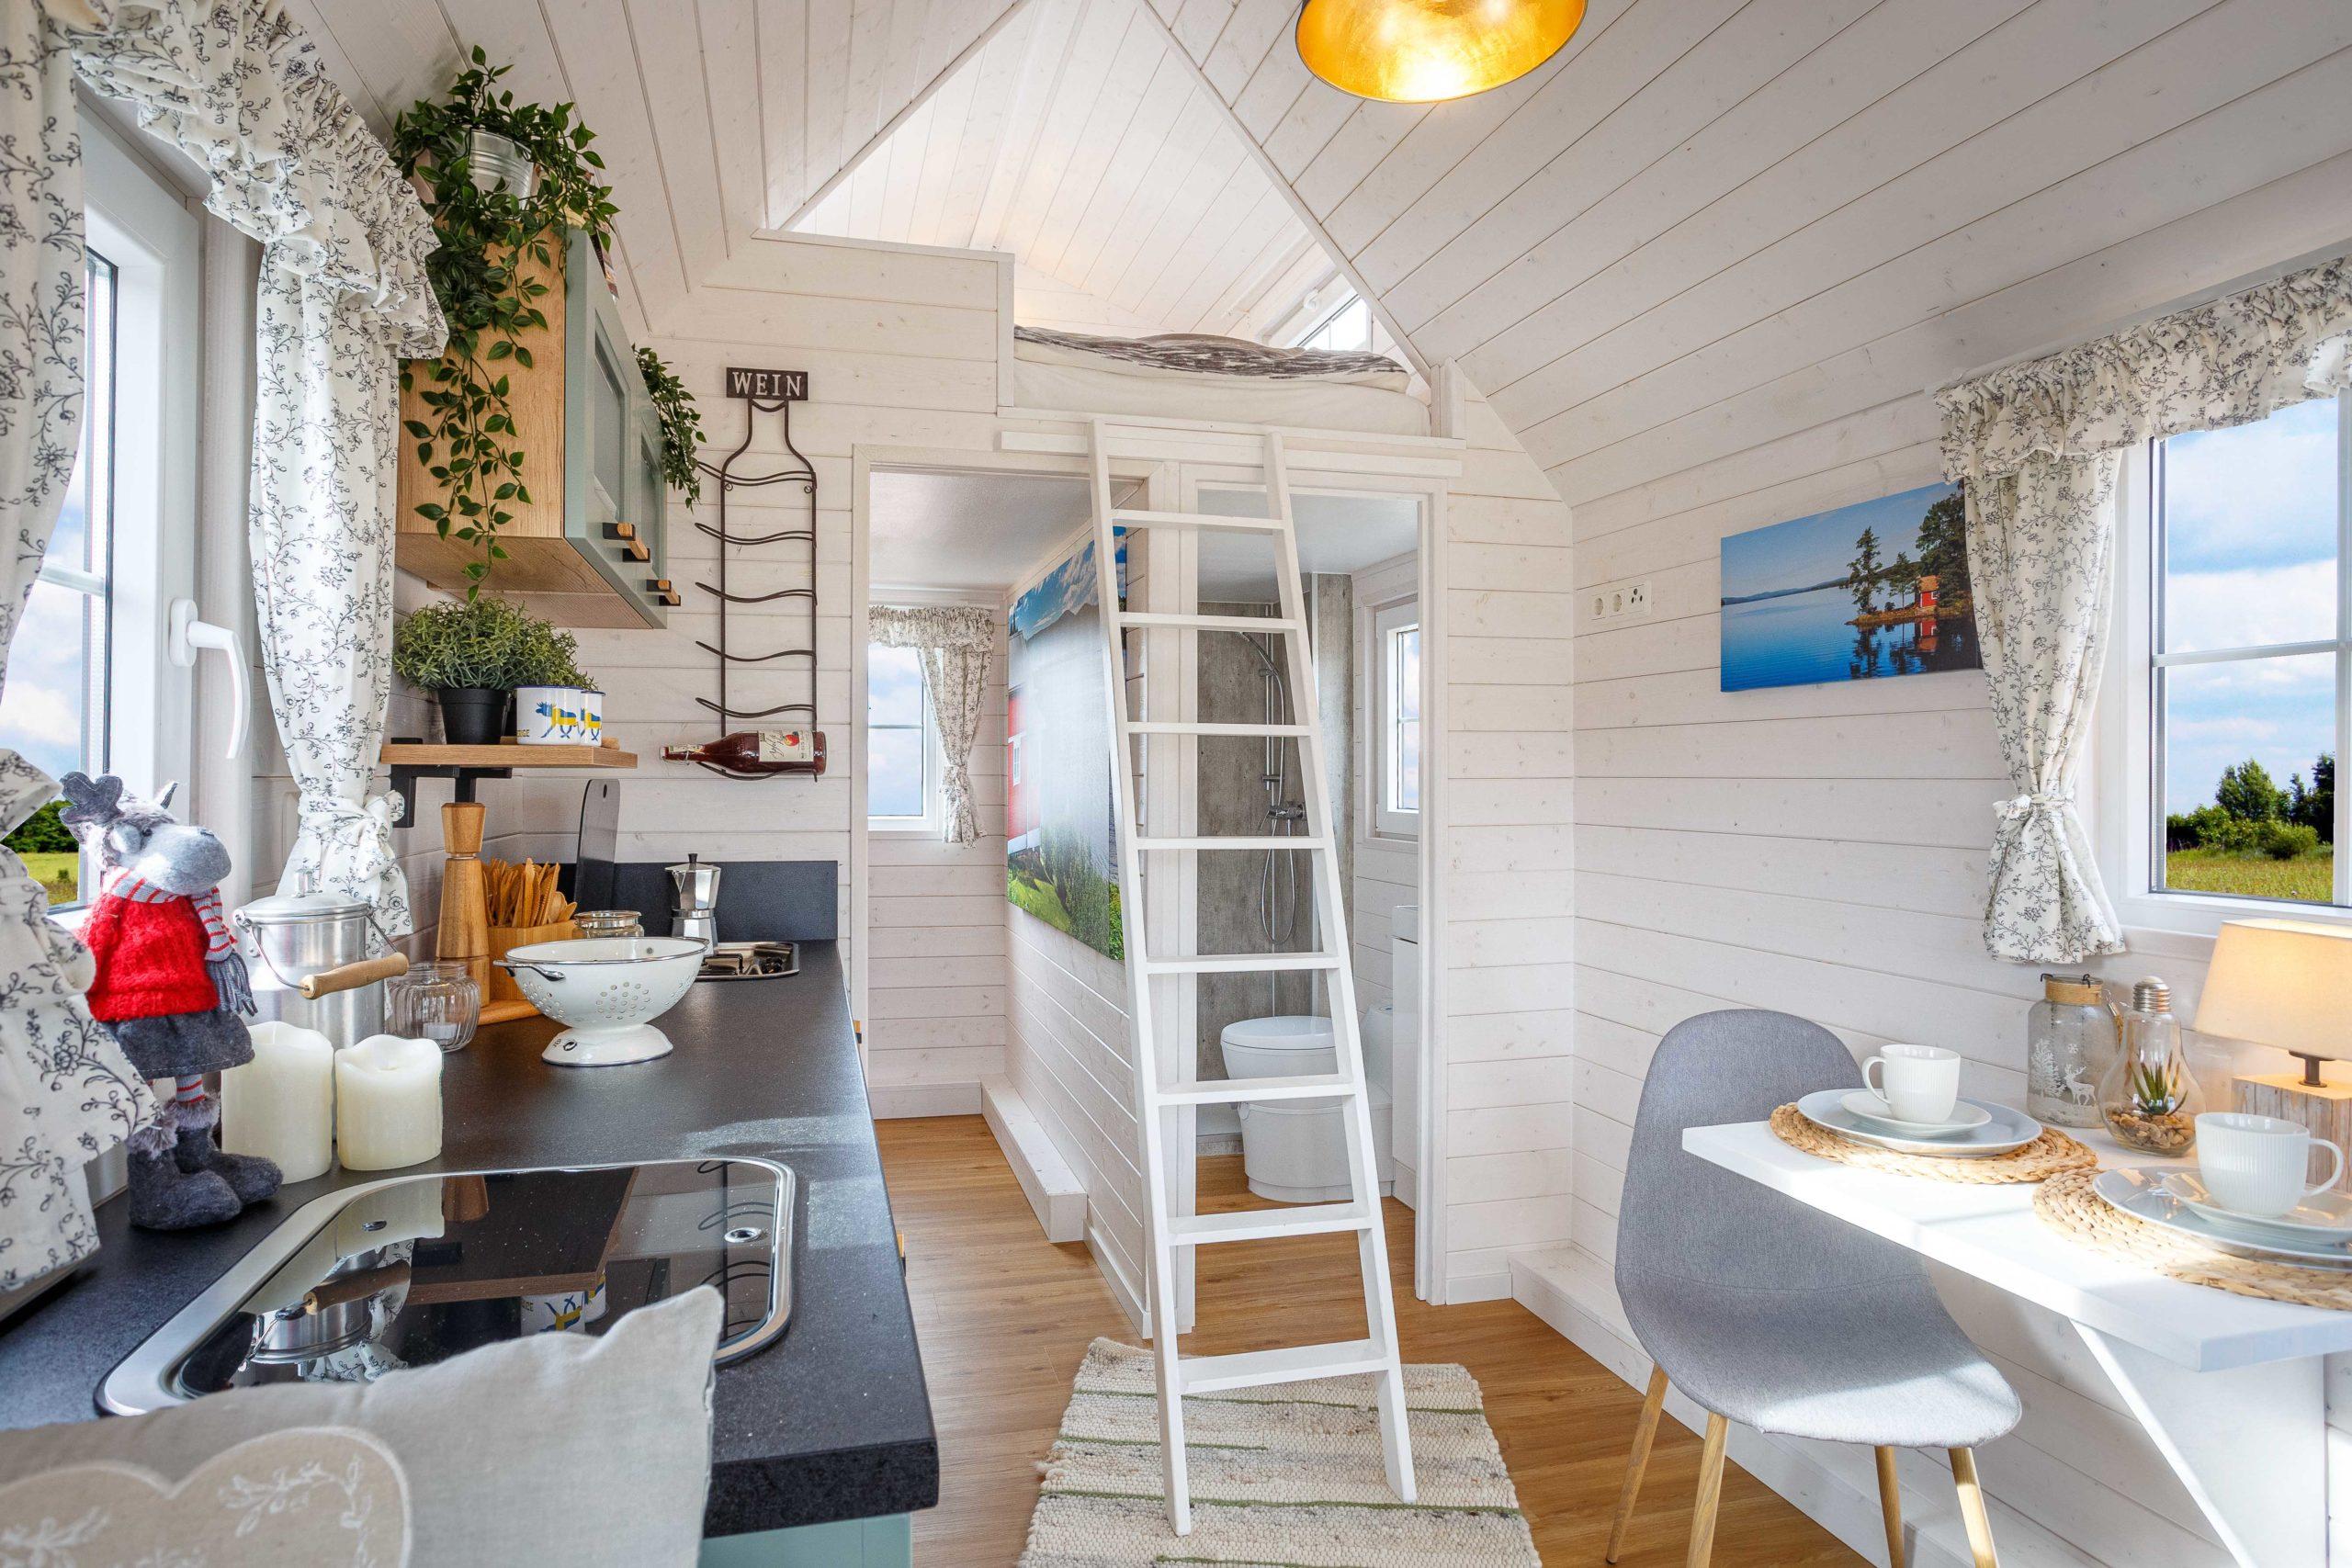 mobiles-tiny-house-schweden-vital-camp-gmbh-10